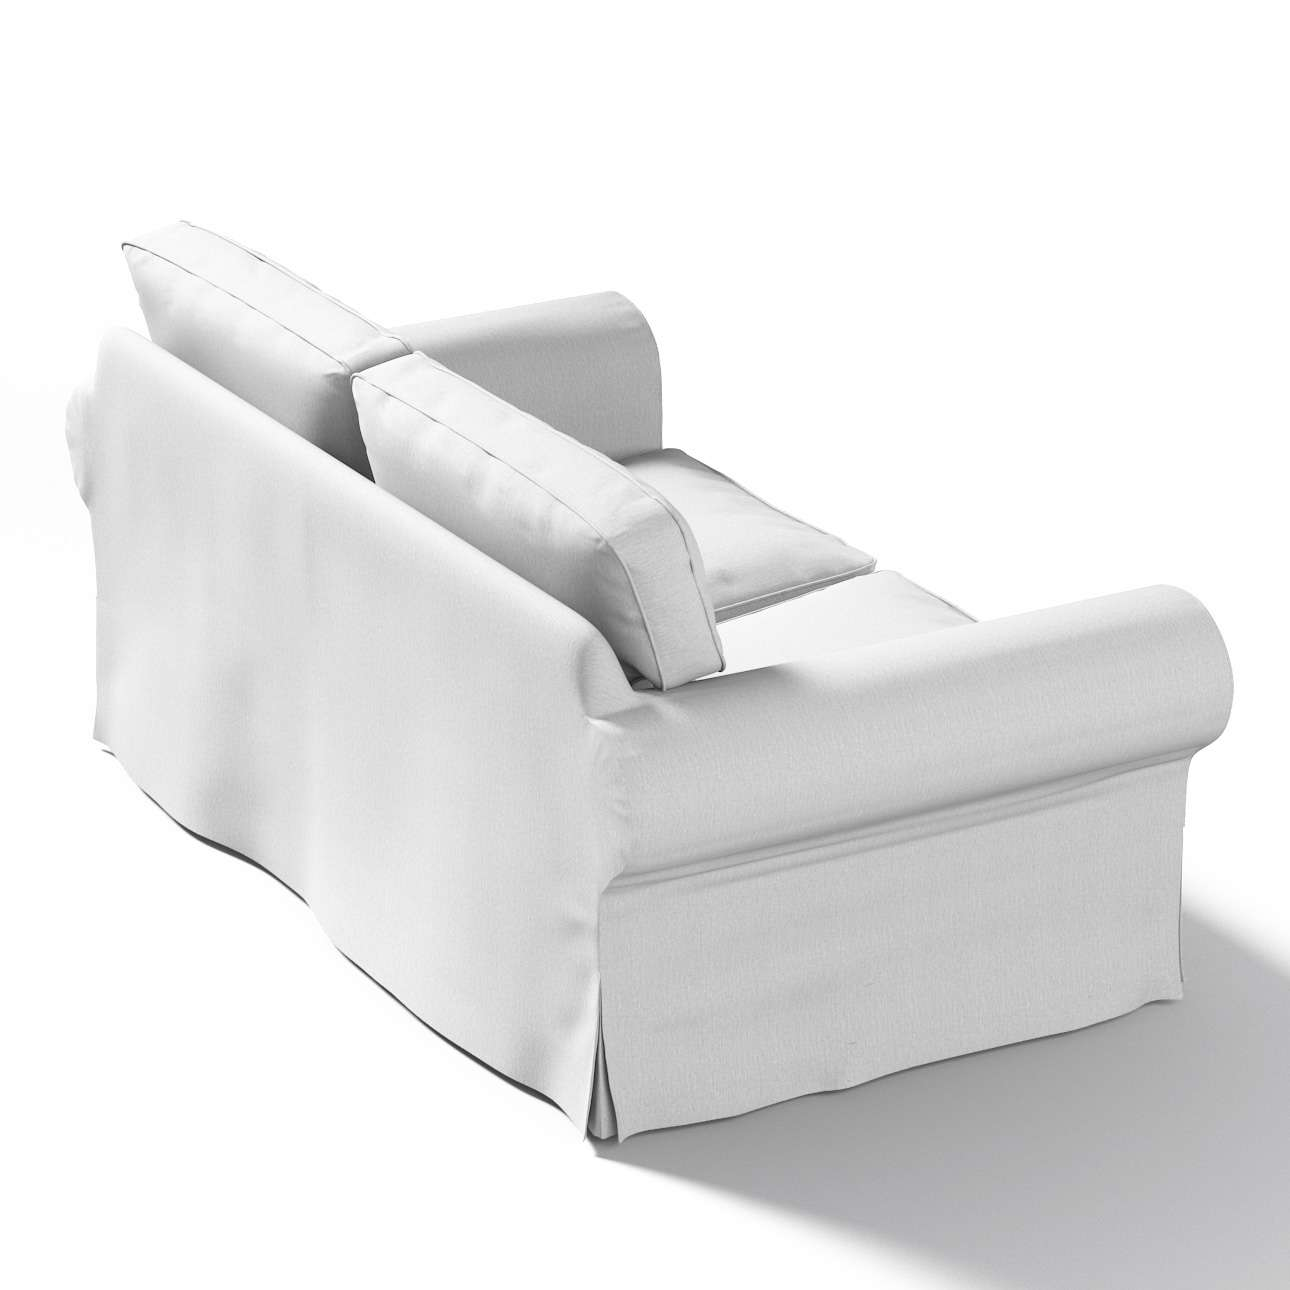 Ektorp 2-Sitzer Schlafsofabezug  ALTES Modell Sofabezug Ektorp 2-Sitzer Schlafsofa altes Modell von der Kollektion Chenille , Stoff: 702-23